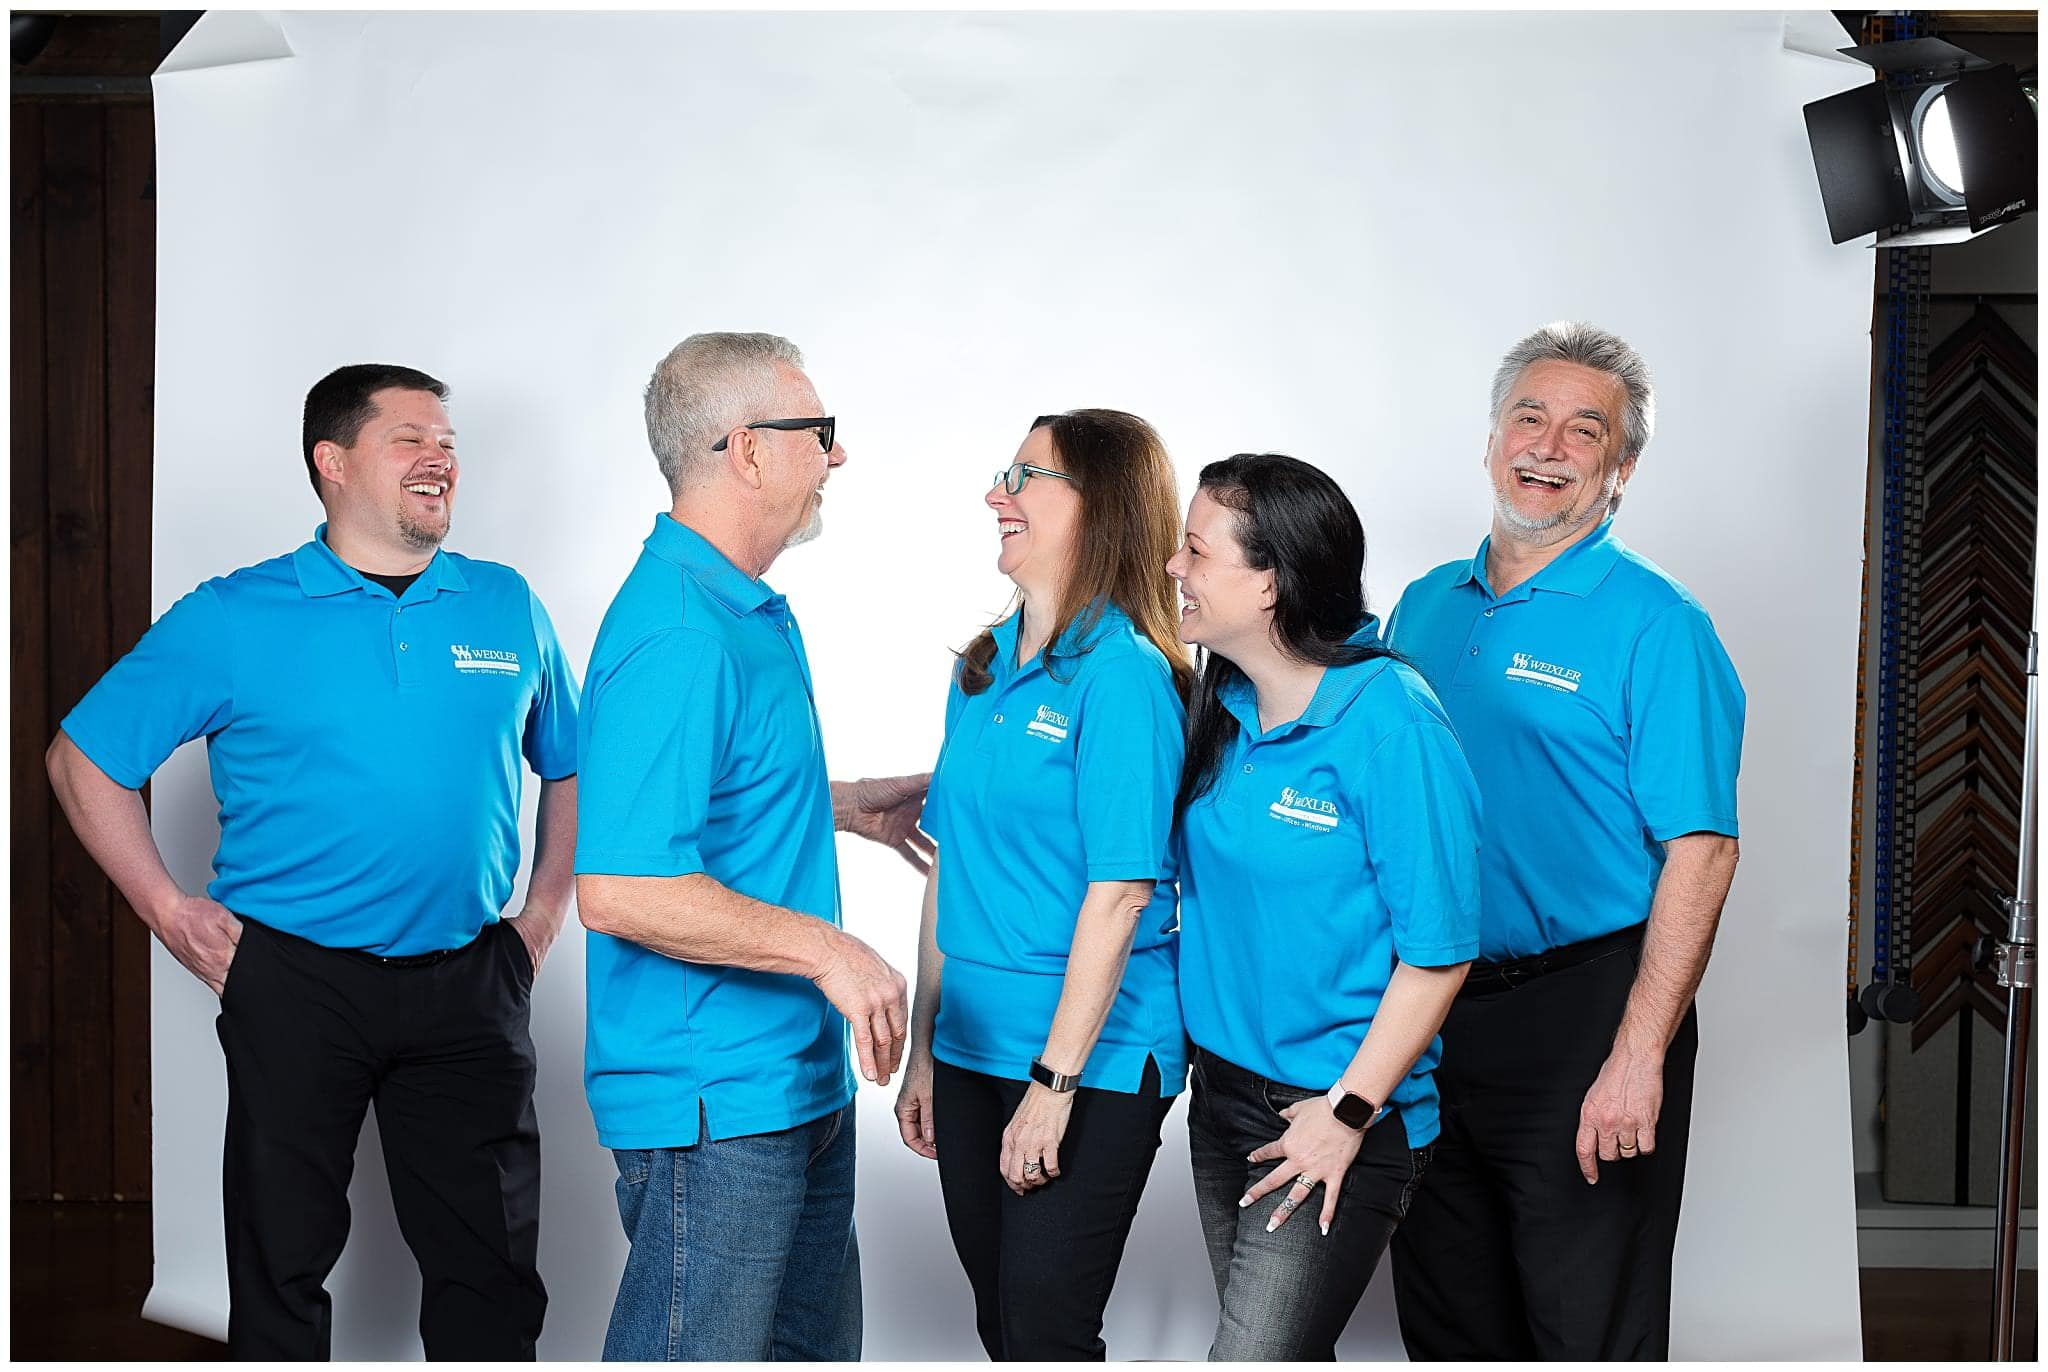 team photo at headshot studio in berks county pa